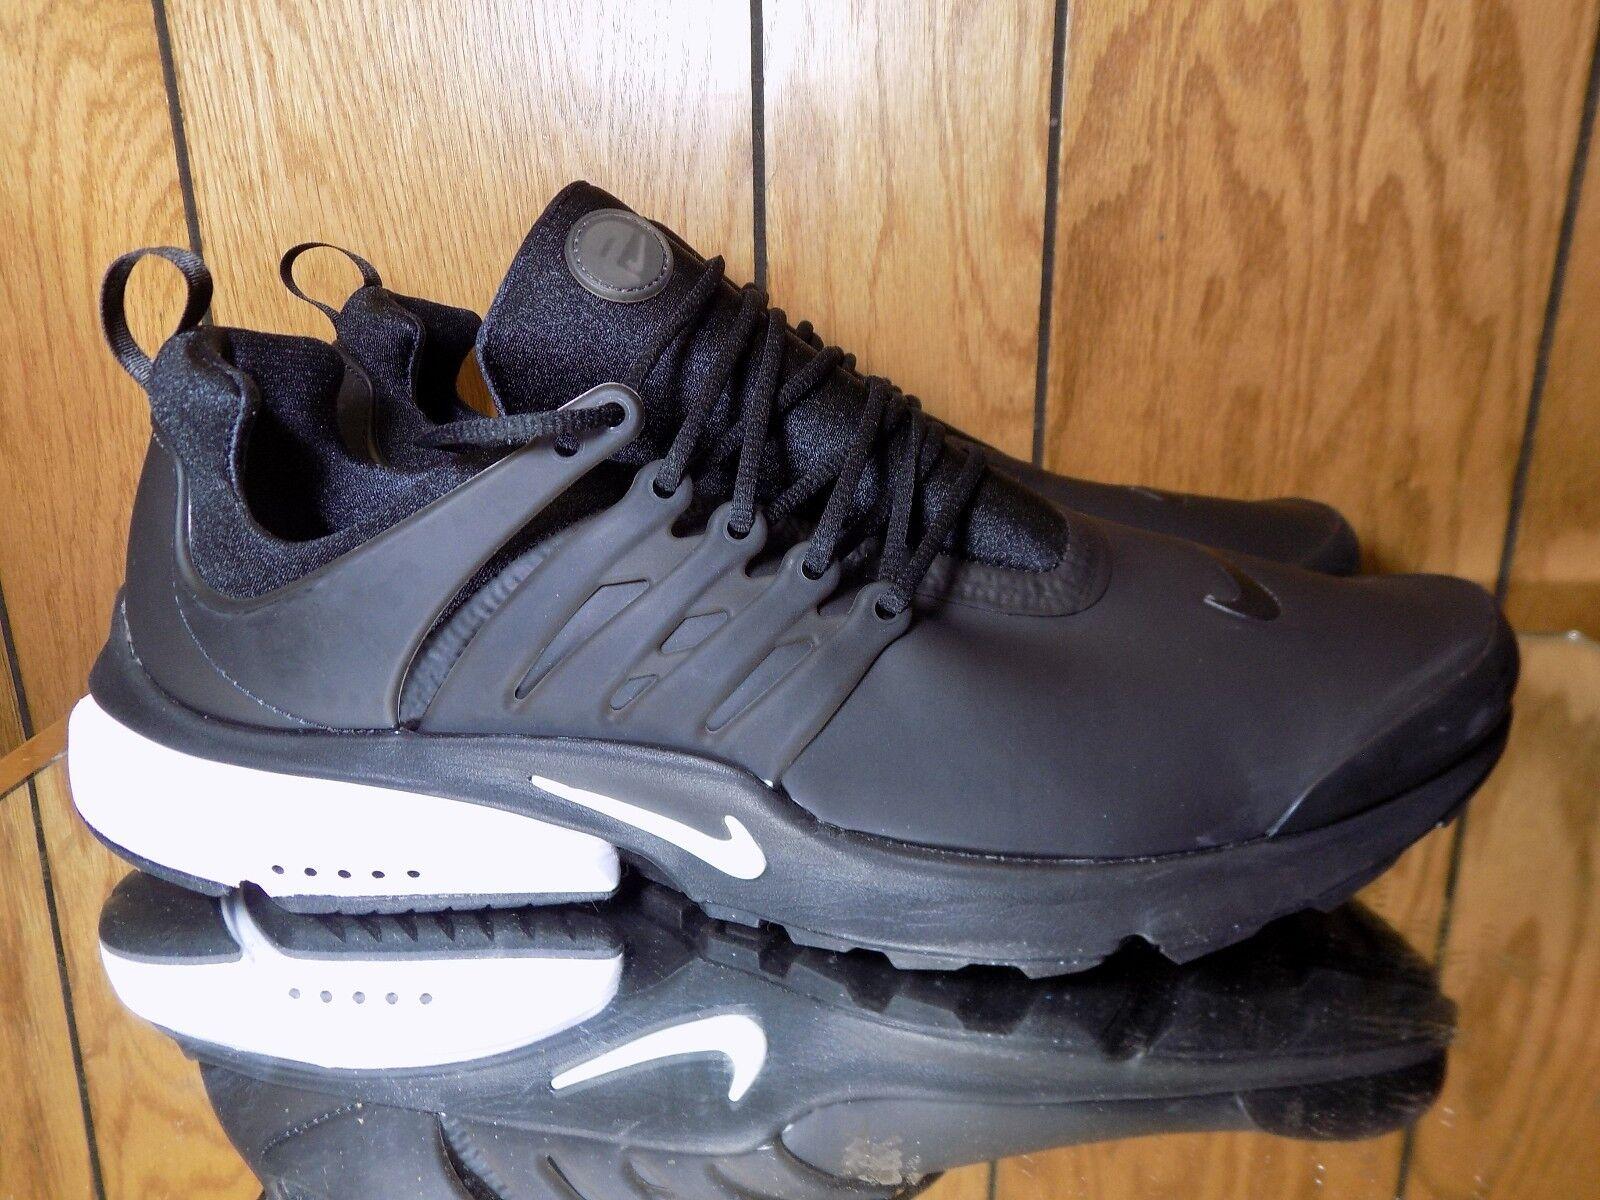 Men's Nike Air Presto Low Utility Athletic Fashion Sneakers 862749 003  s 14